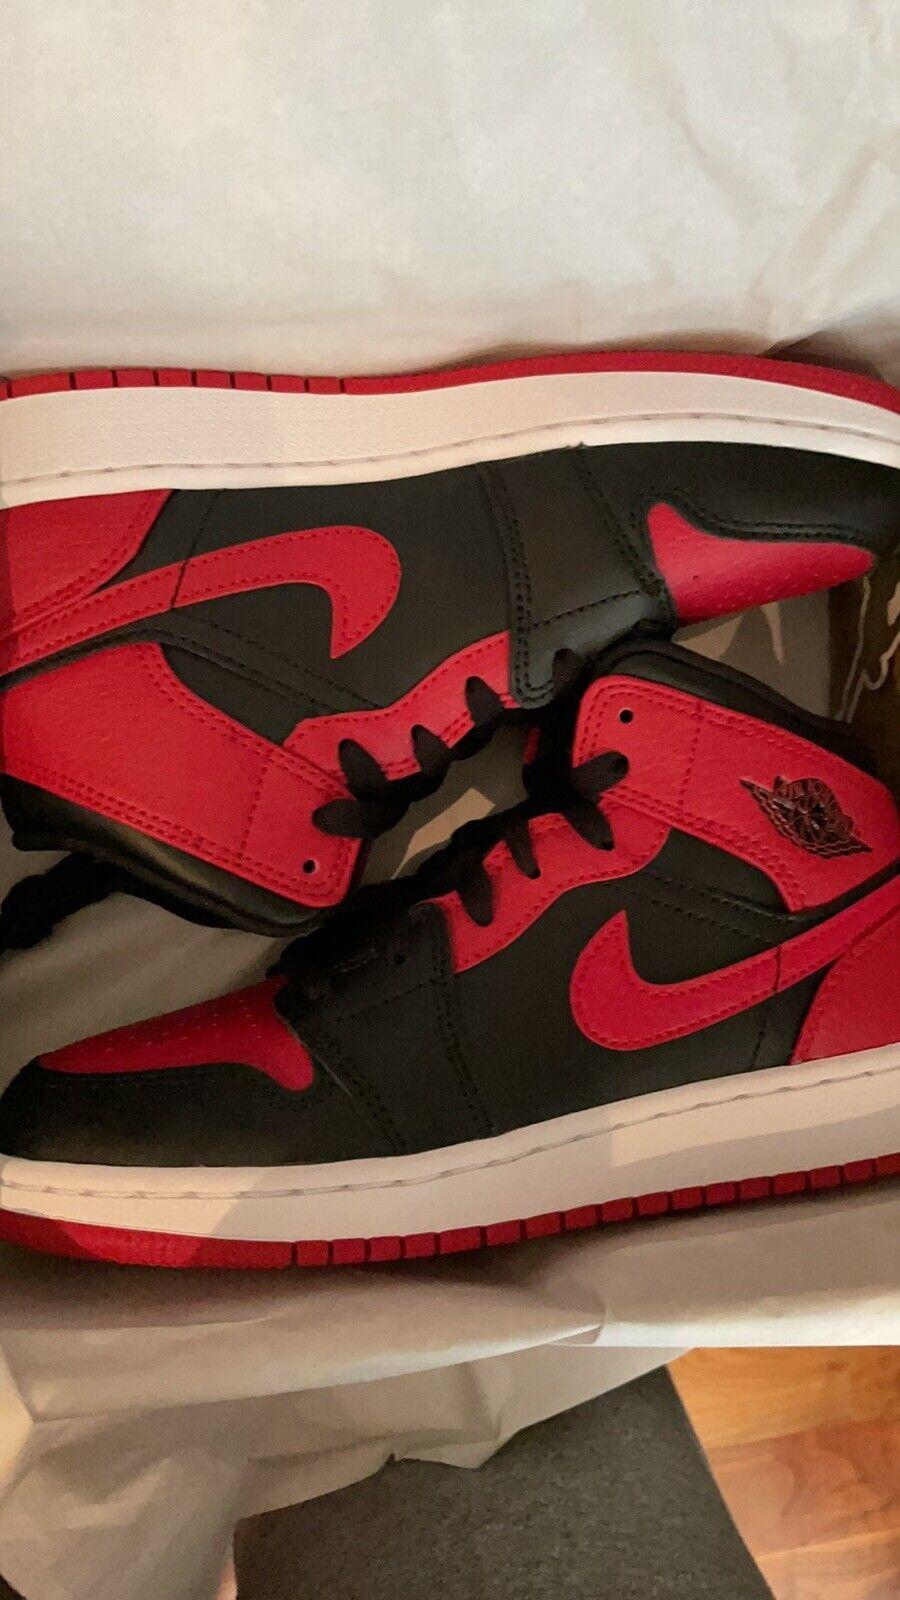 Nike Jordan 1 Mid Banned 2020 GS UK3.5 US4Y Brand New Trusted Seller